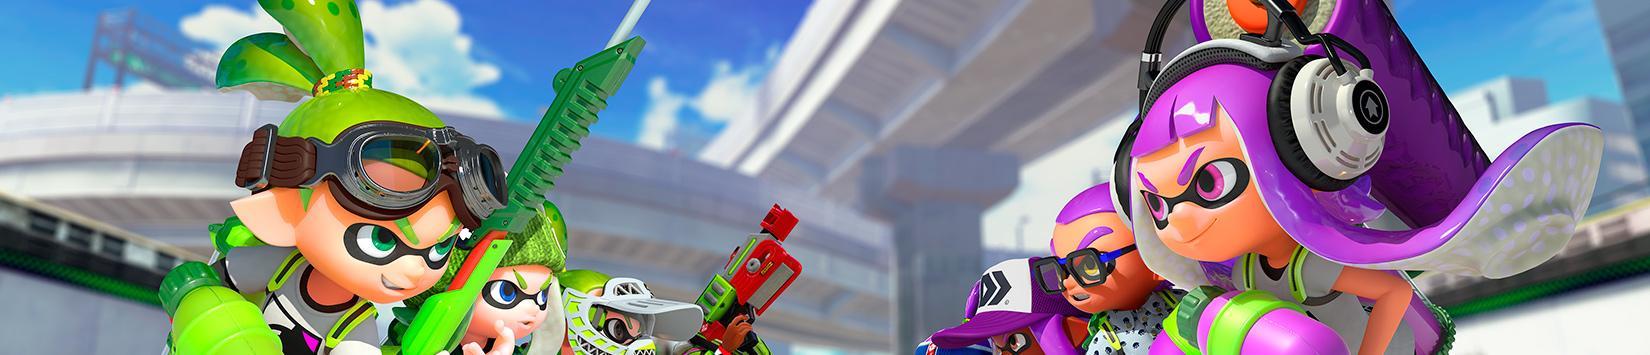 Nintendo y ESL - Splatoon